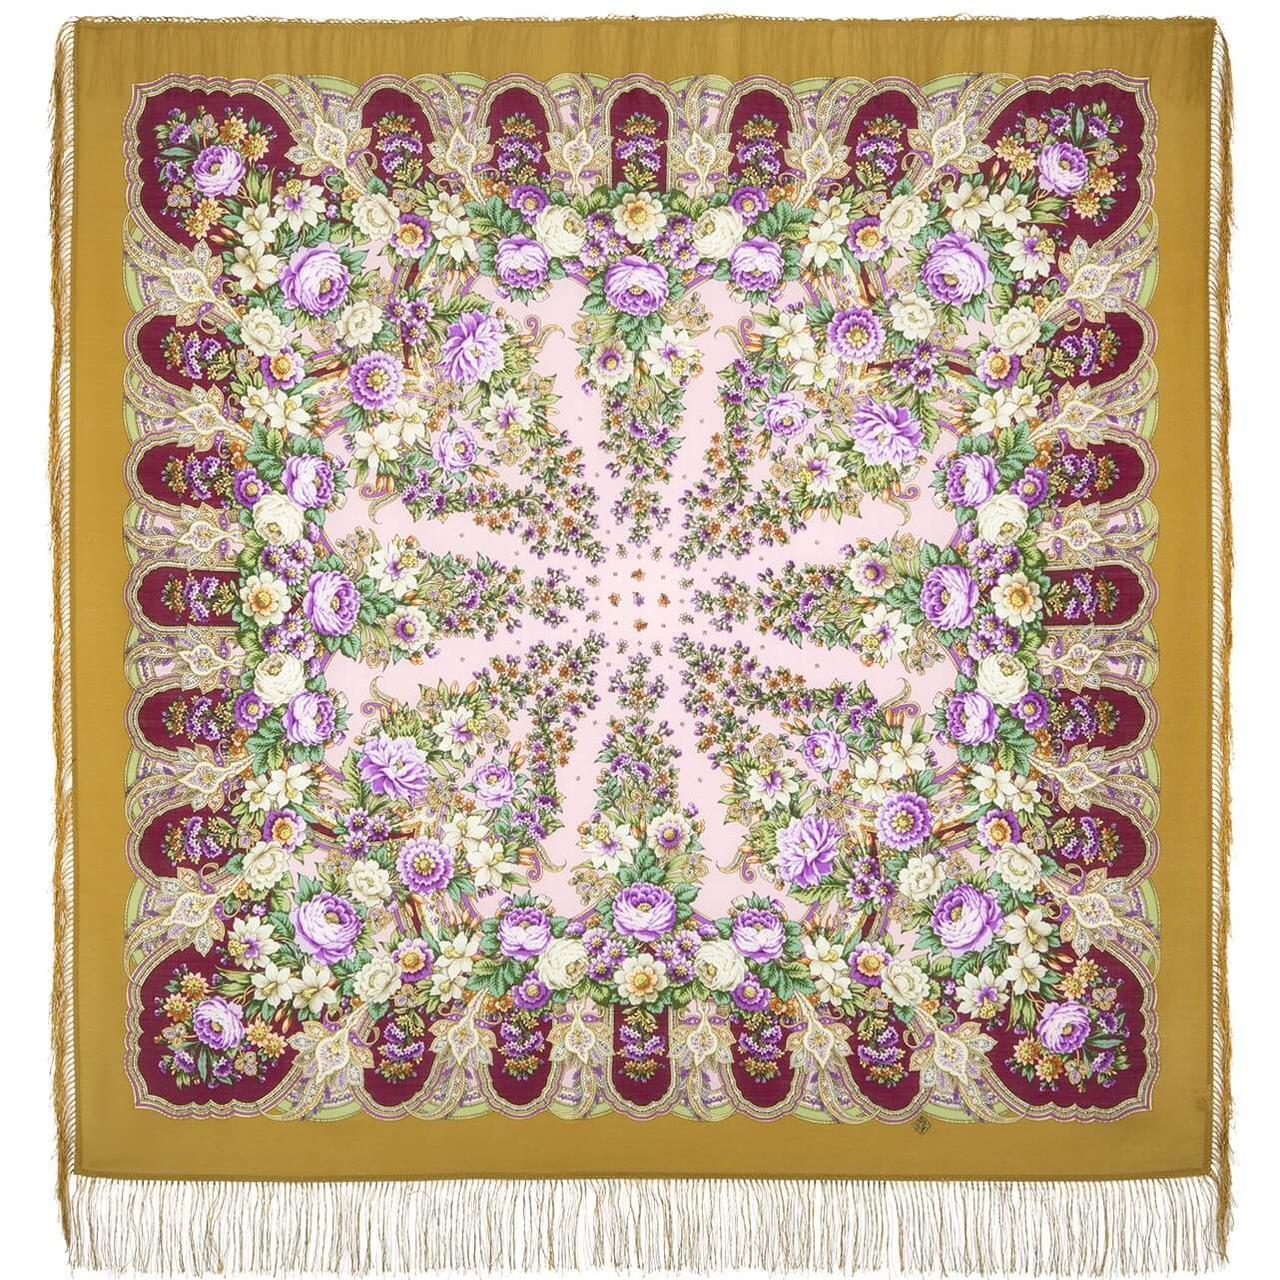 Павлопосадский платок Лукоморье 1555-7 (146х146 см)